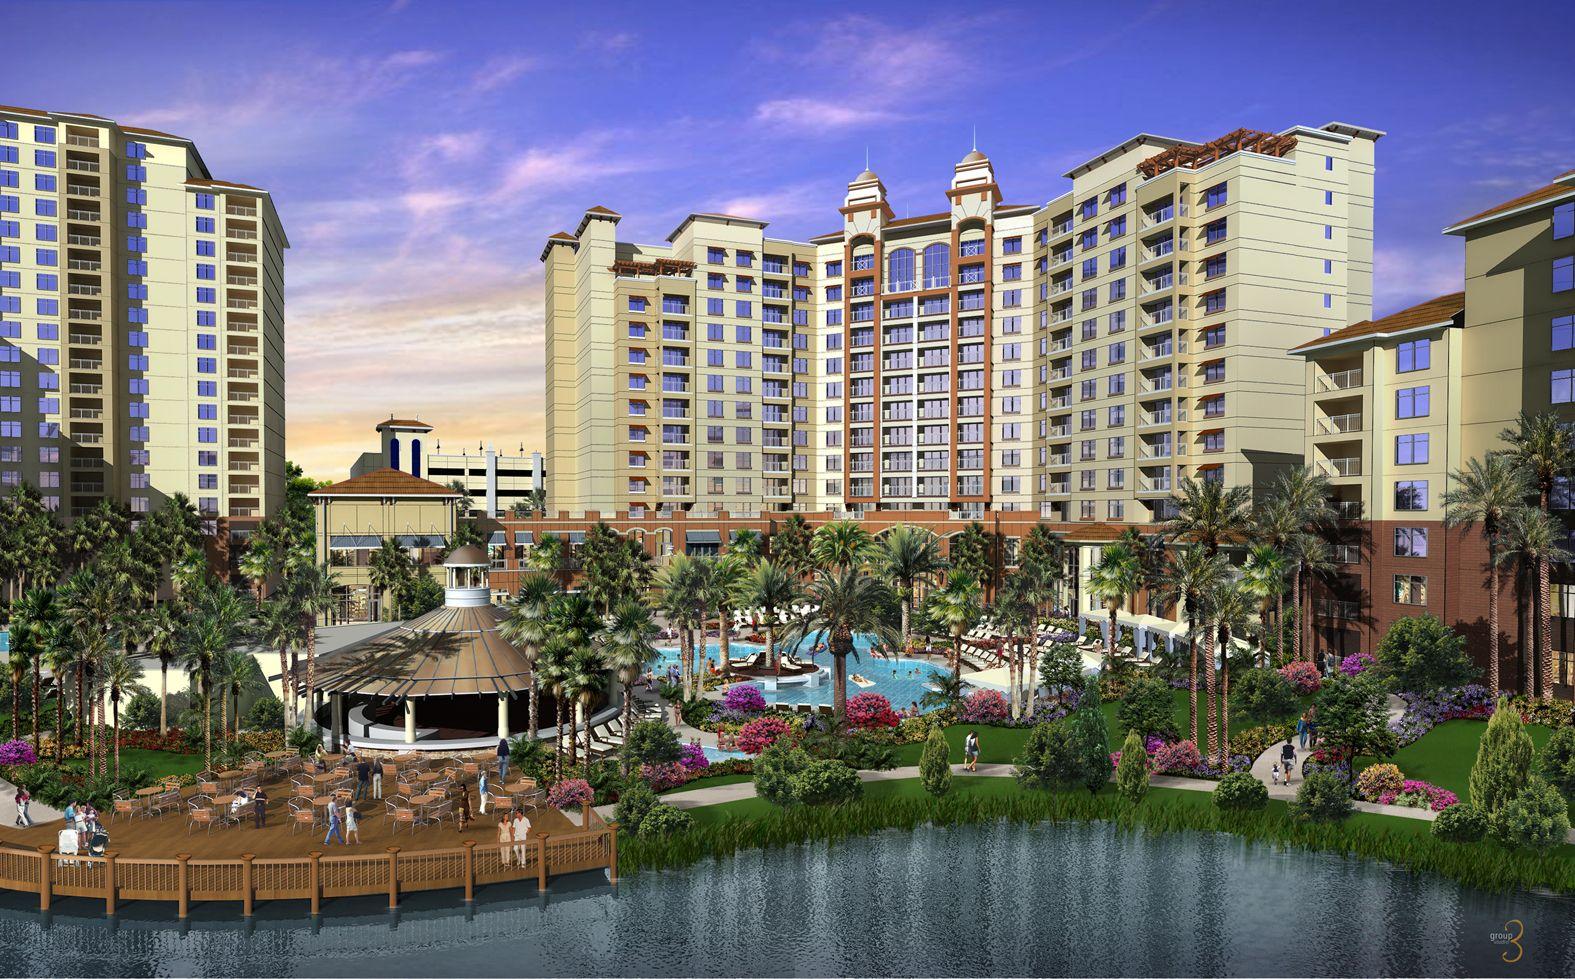 Enjoy Breakfast And Free Wifi At The Wyndham Grand Orlando Resort Bonnet Creek In Fl Save With Rewards Award Winning Hotel